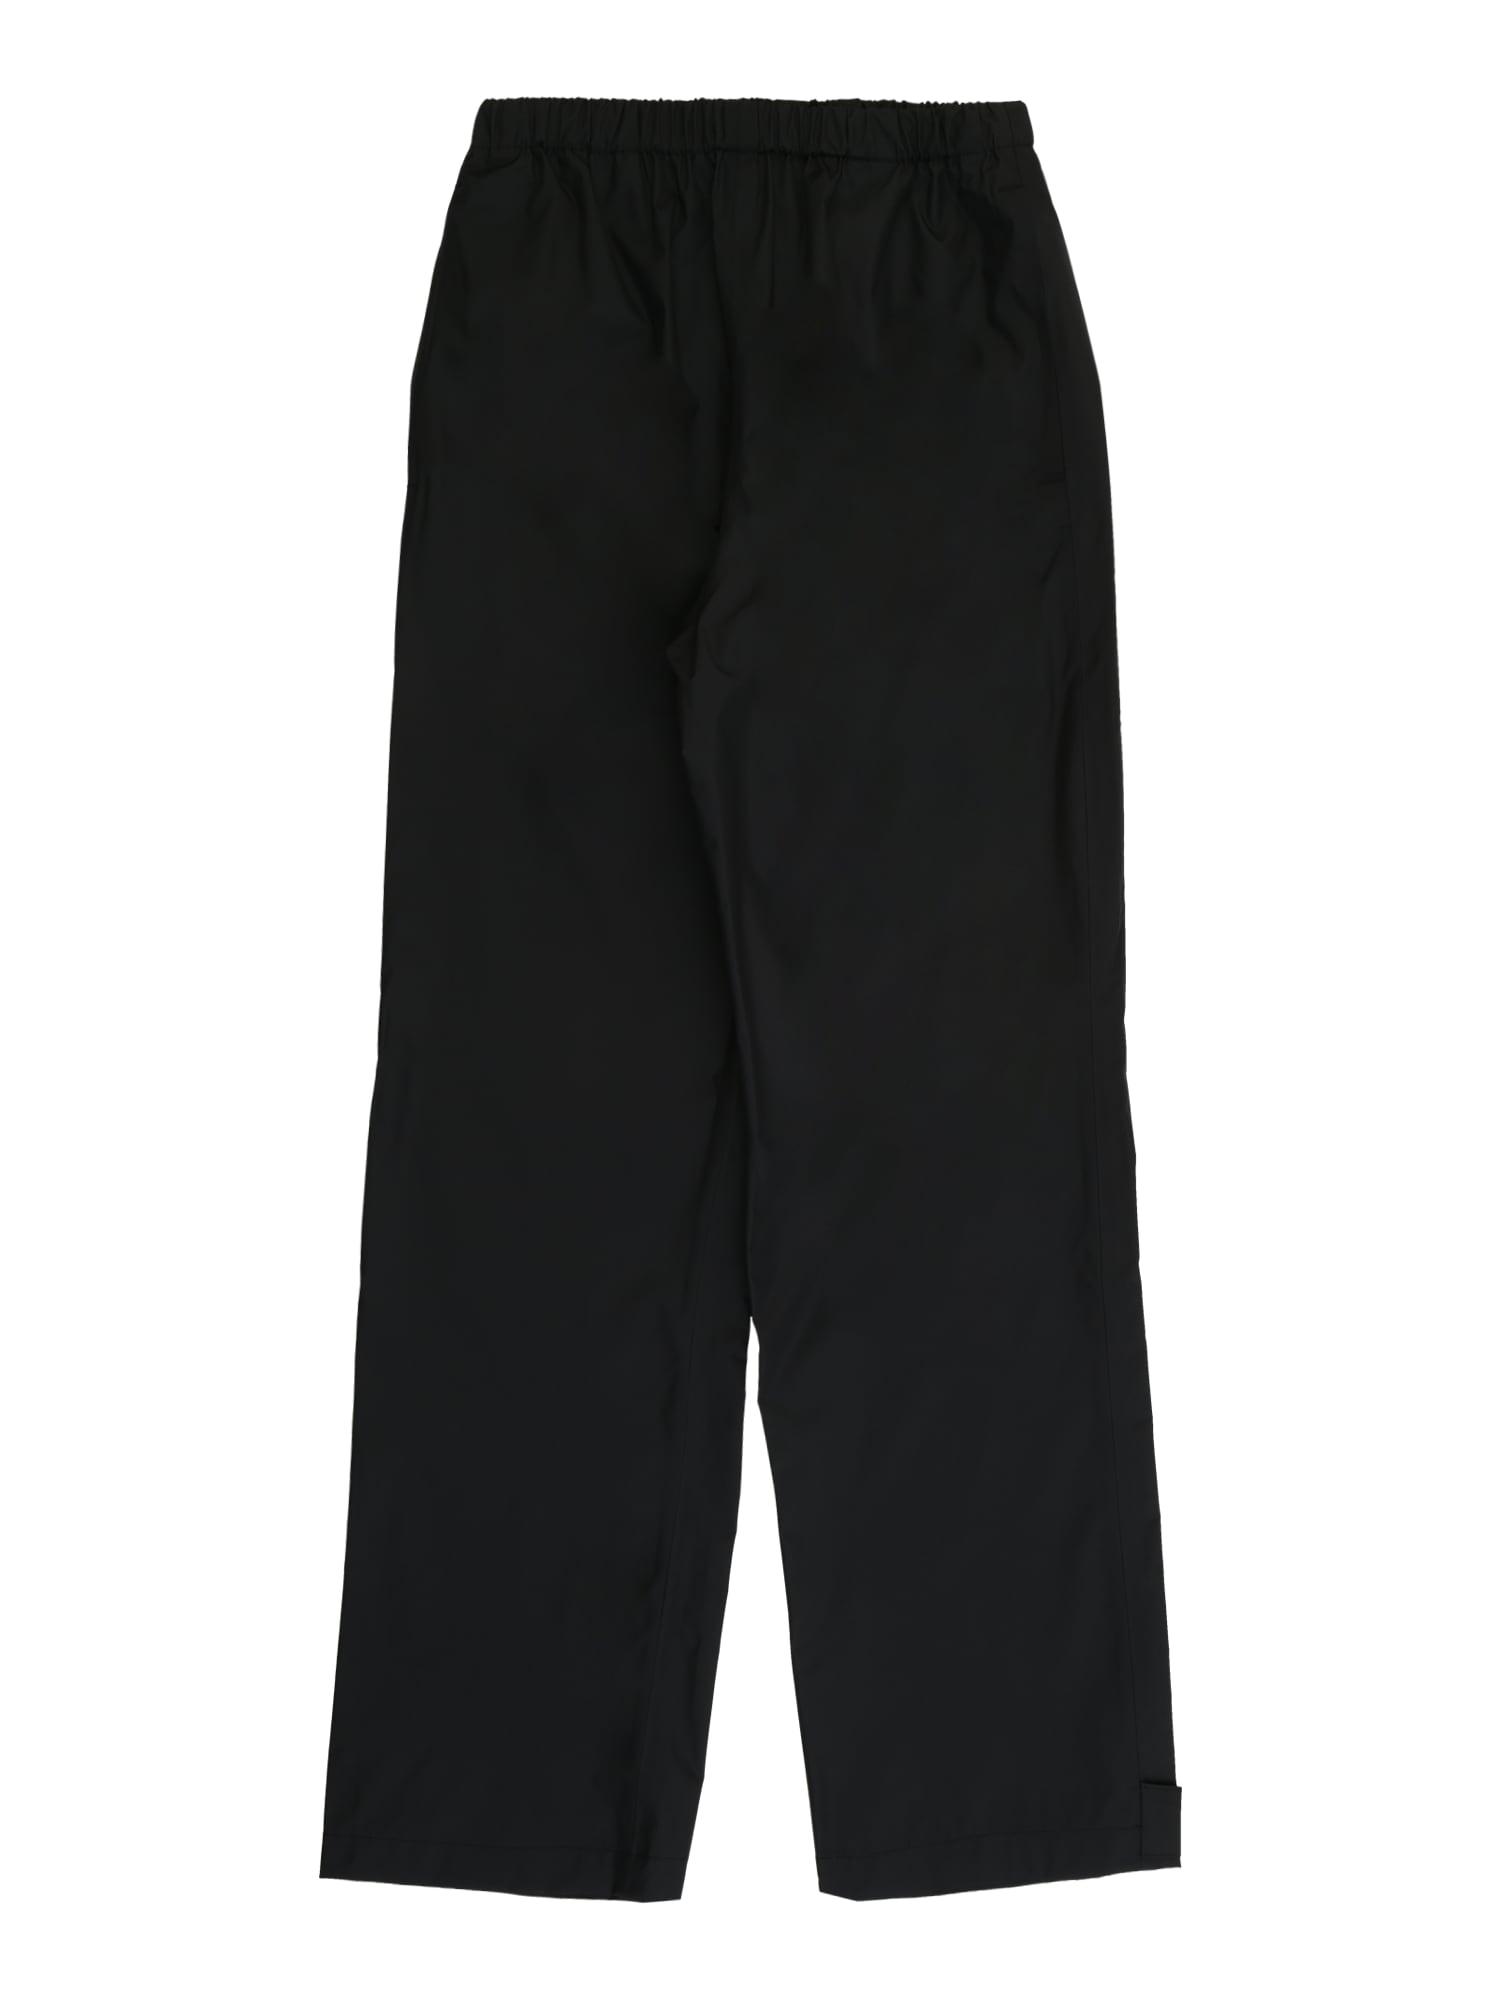 COLUMBIA Outodoor kalhoty 'Trail Adventure™ '  černá